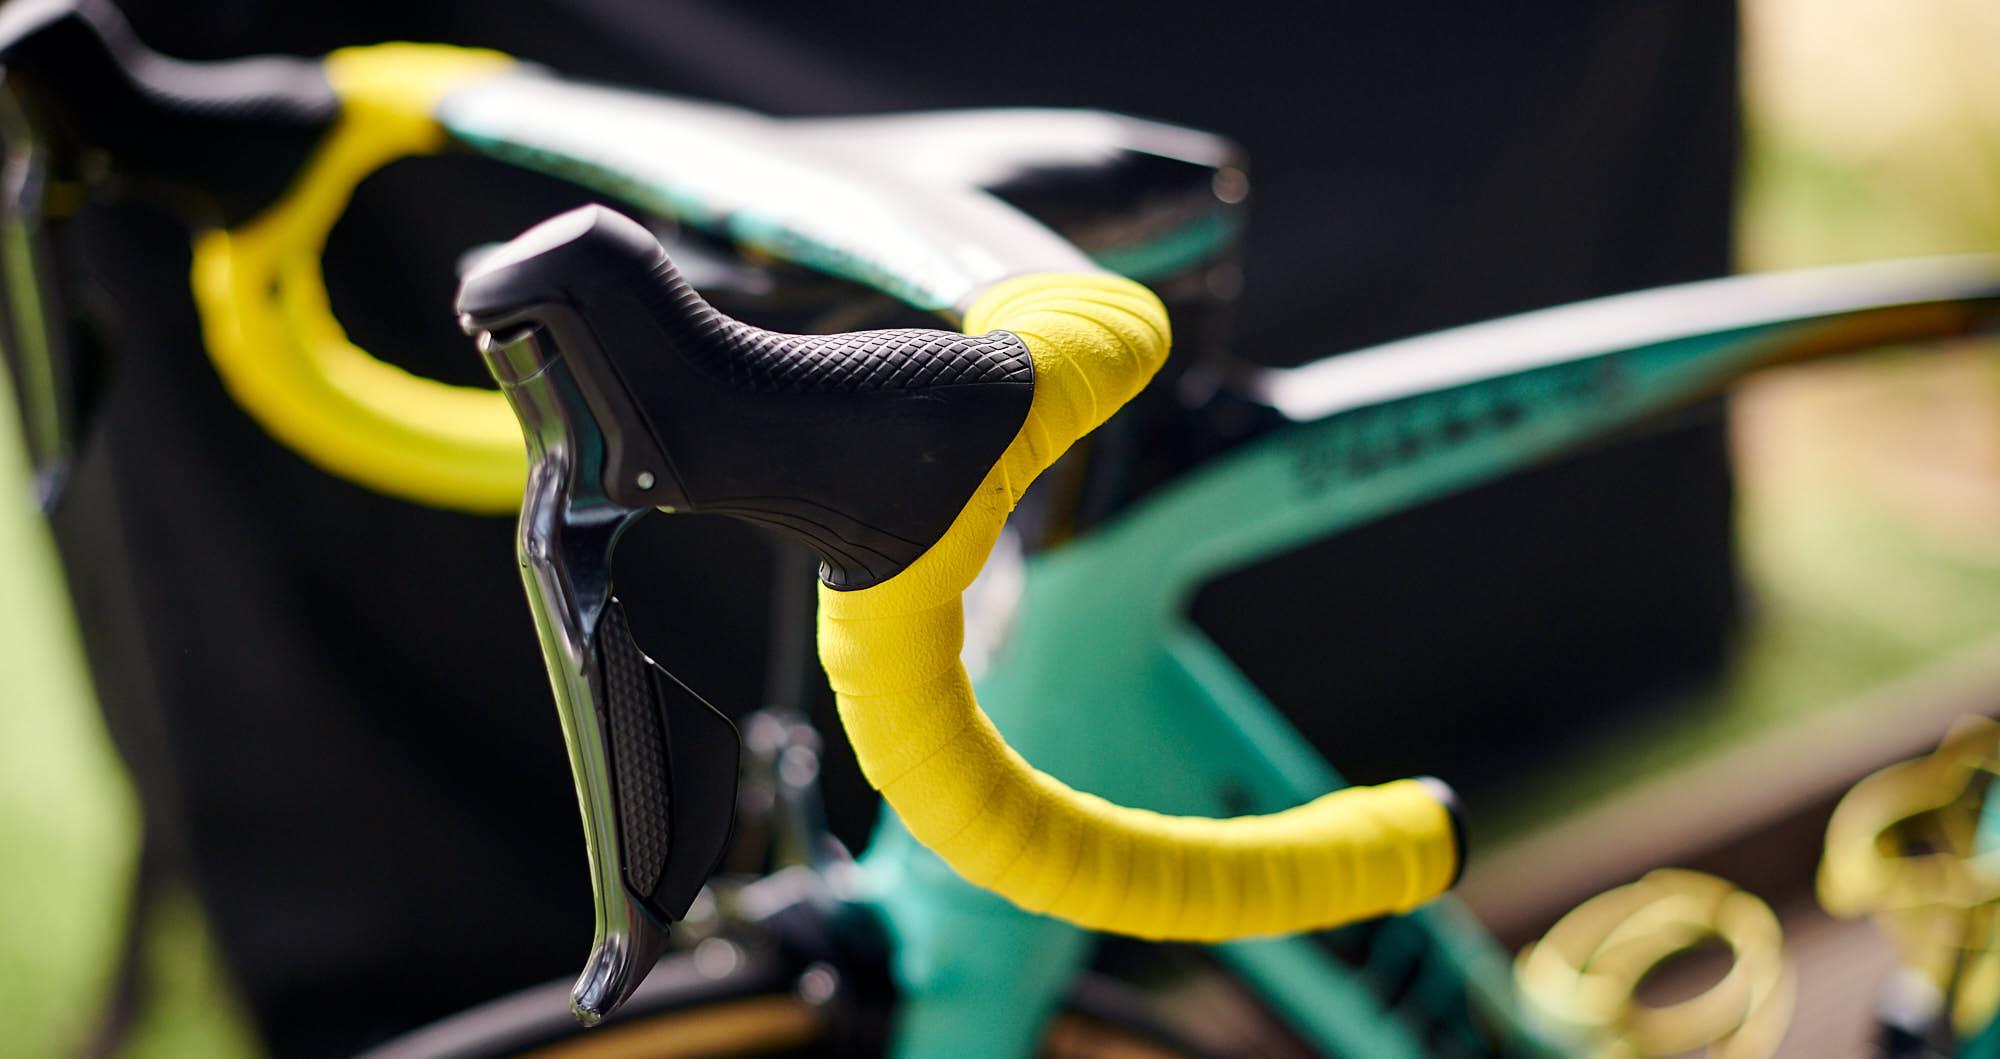 Mike Teunissen's bike in the 2019 Tour de France